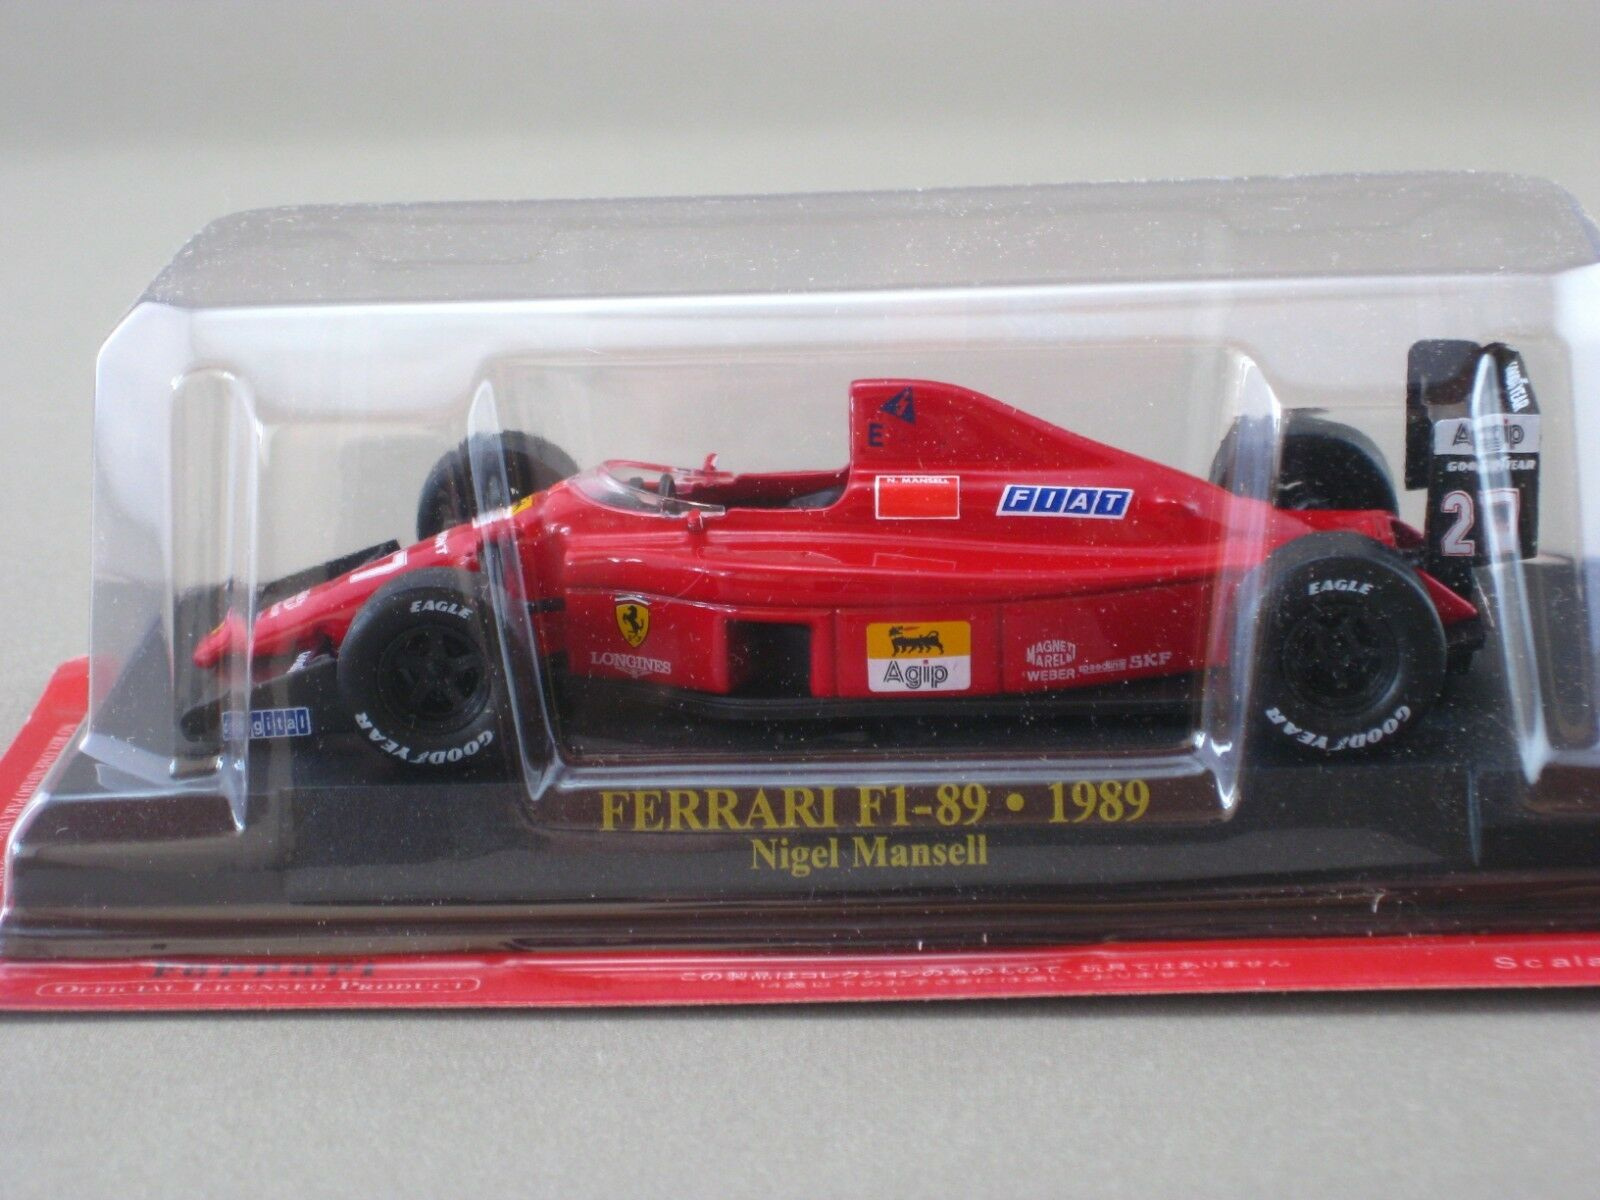 Ferrari F1 89 1989 Nigel Mansell hachette 1 43 Diecast modell Car Vol.19